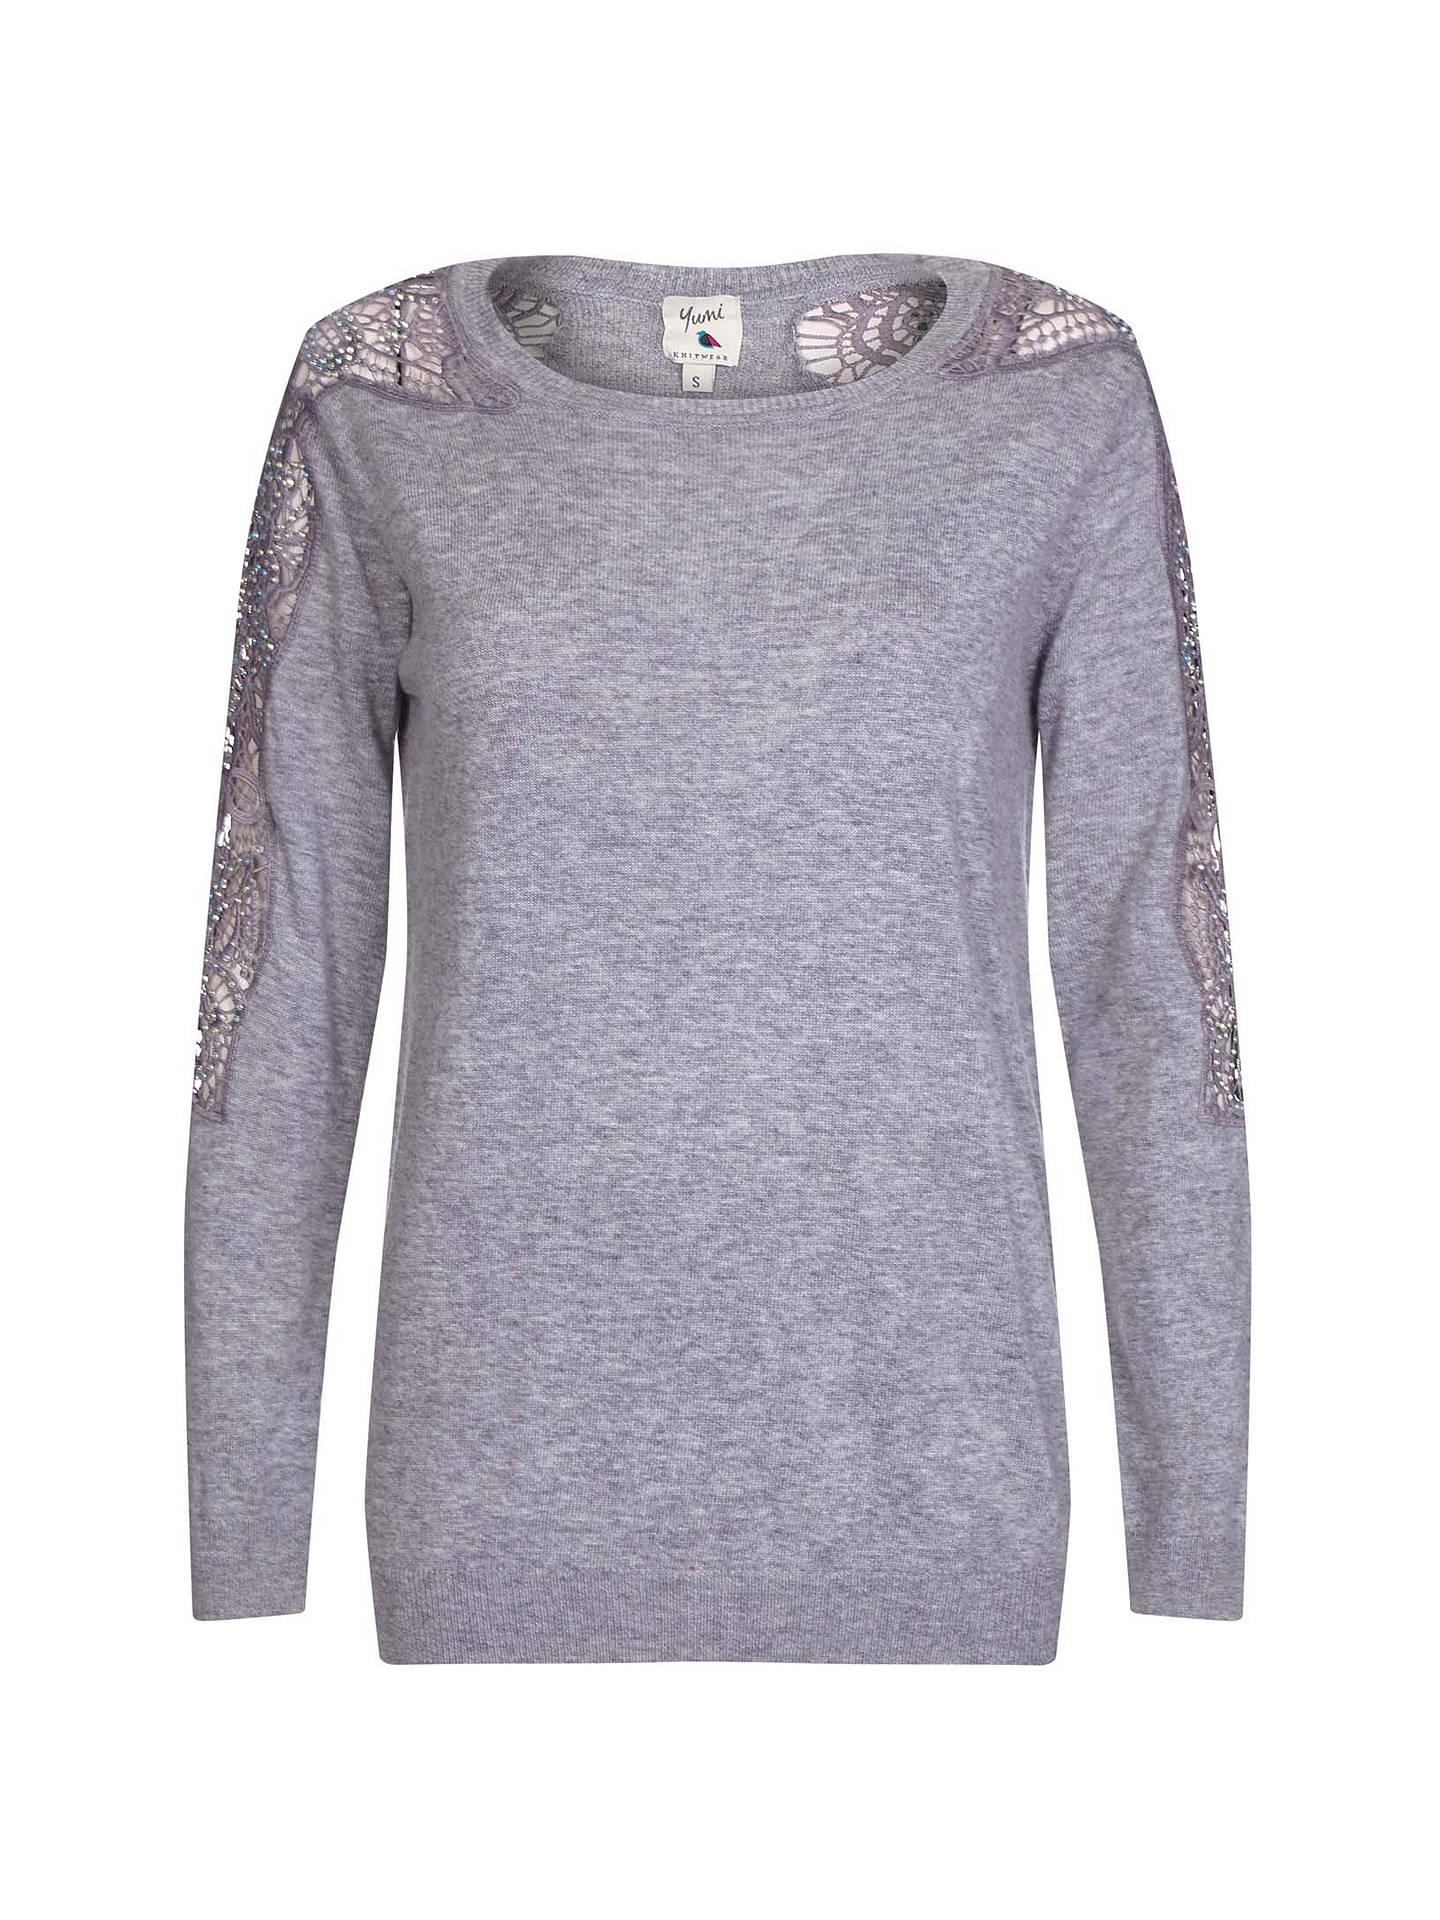 YUNY Men Oversize Lounge Popular Long-Sleeve Polo Top Shirt 9 S